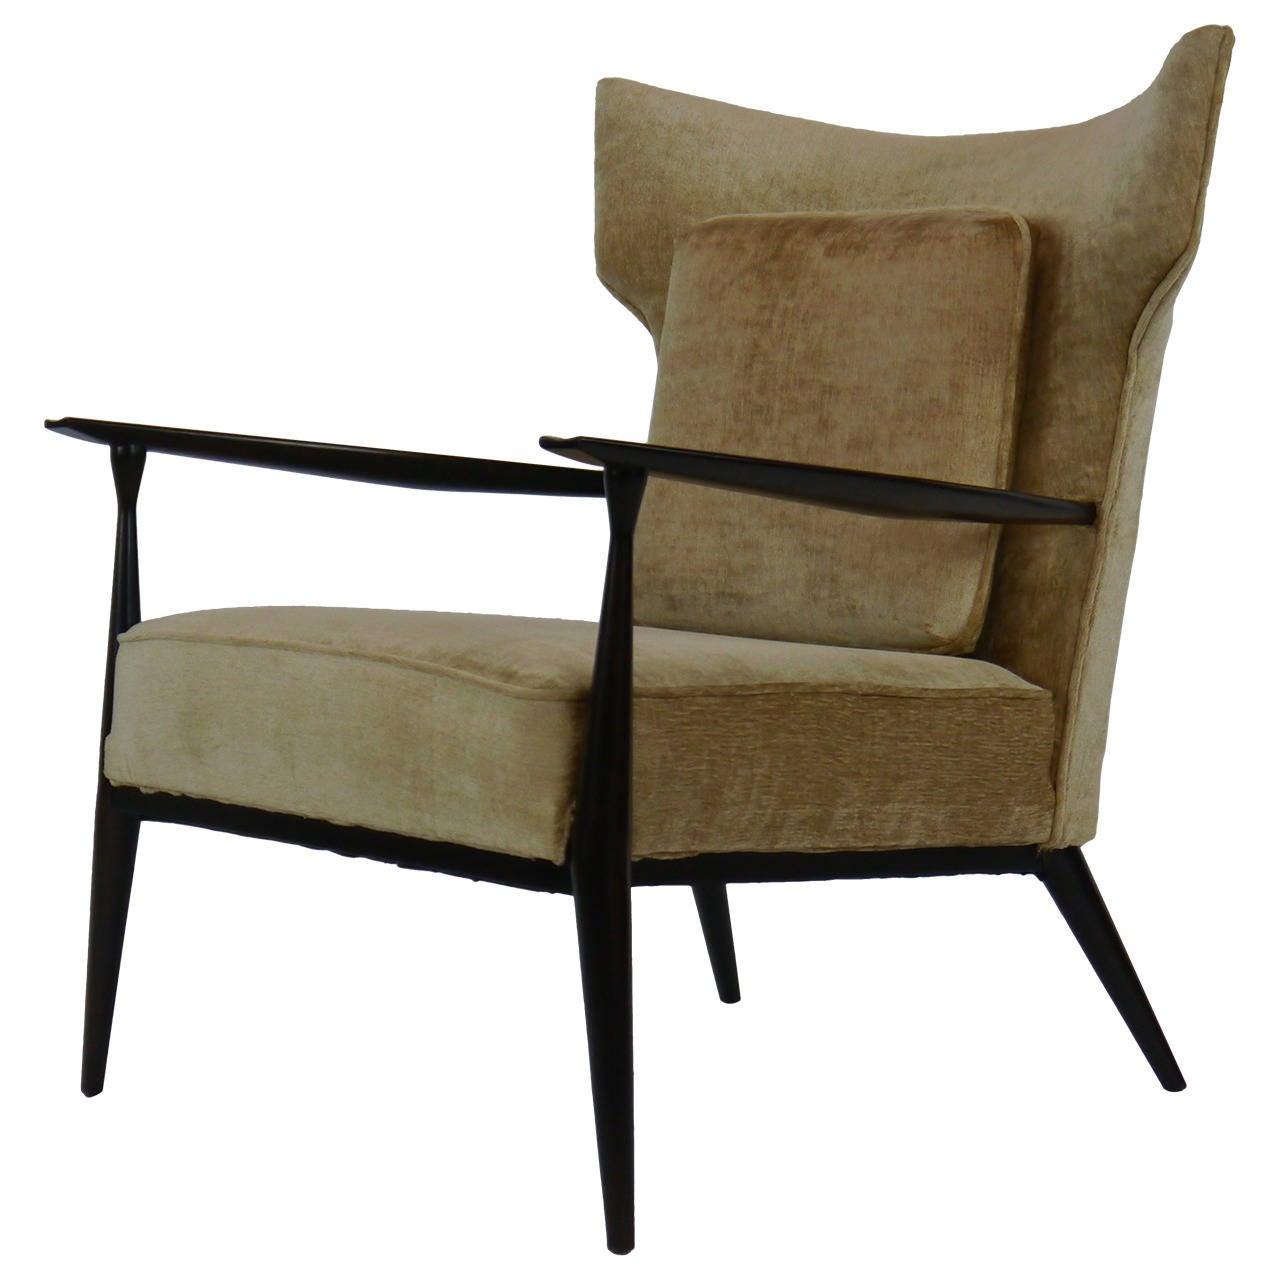 Rare Paul McCobb Wing Lounge Chair at 1stdibs